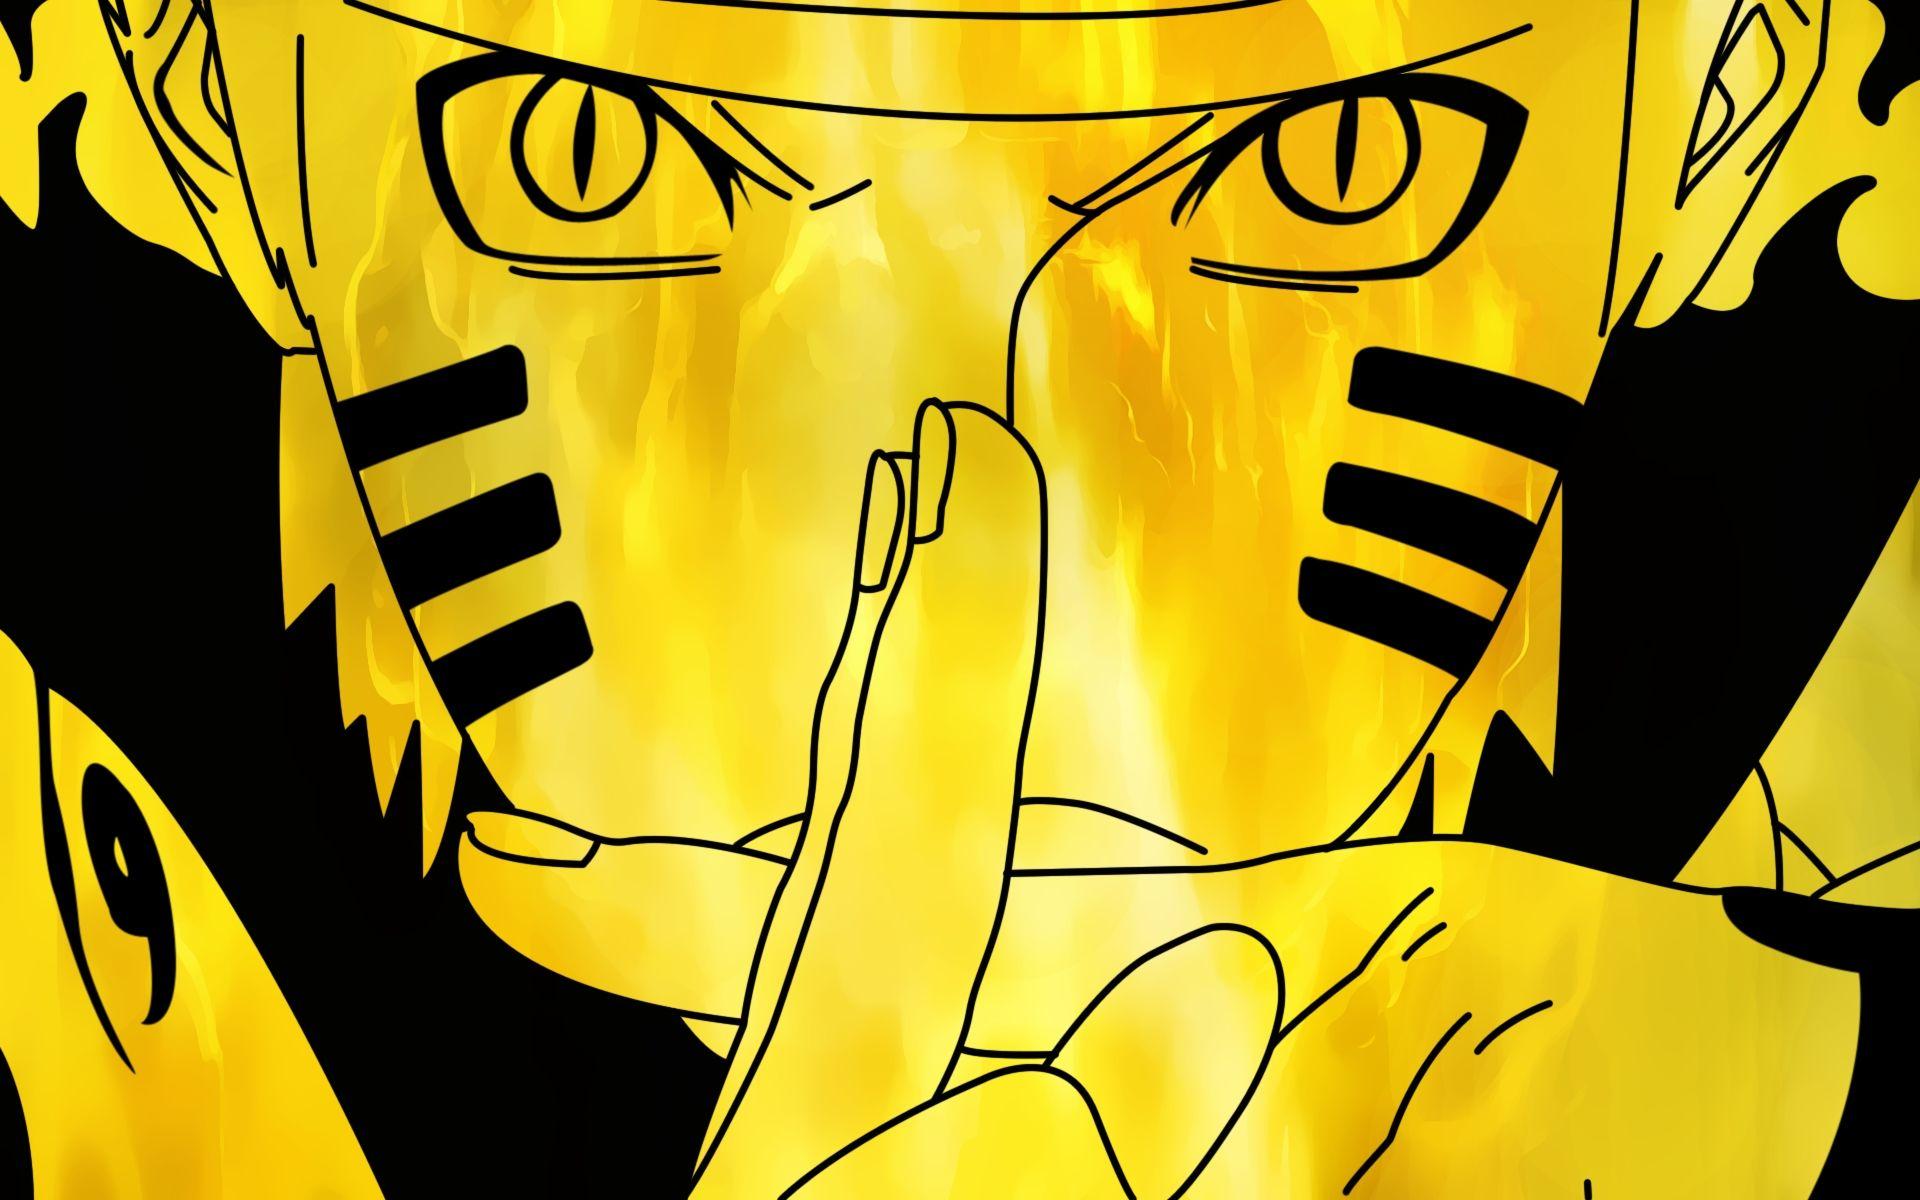 Naruto hd, Best Wallpaper